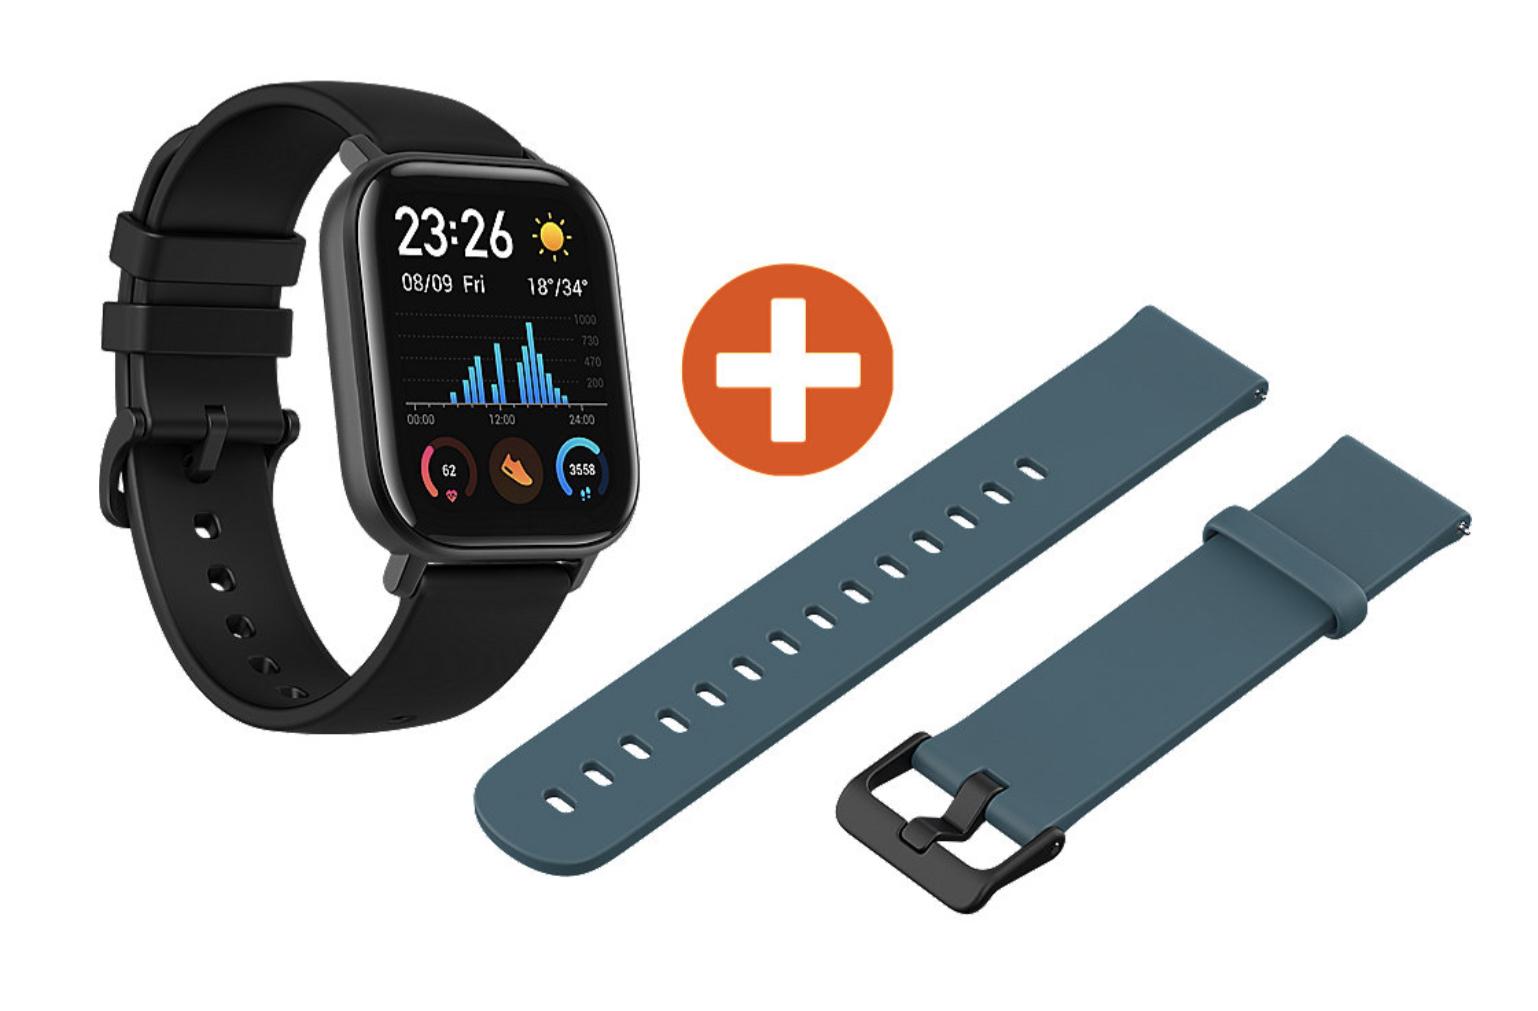 Amazfit GTS Smartwatch Aluminium-Gehäuse, schwarz, Amoled-Display + 2. Armband